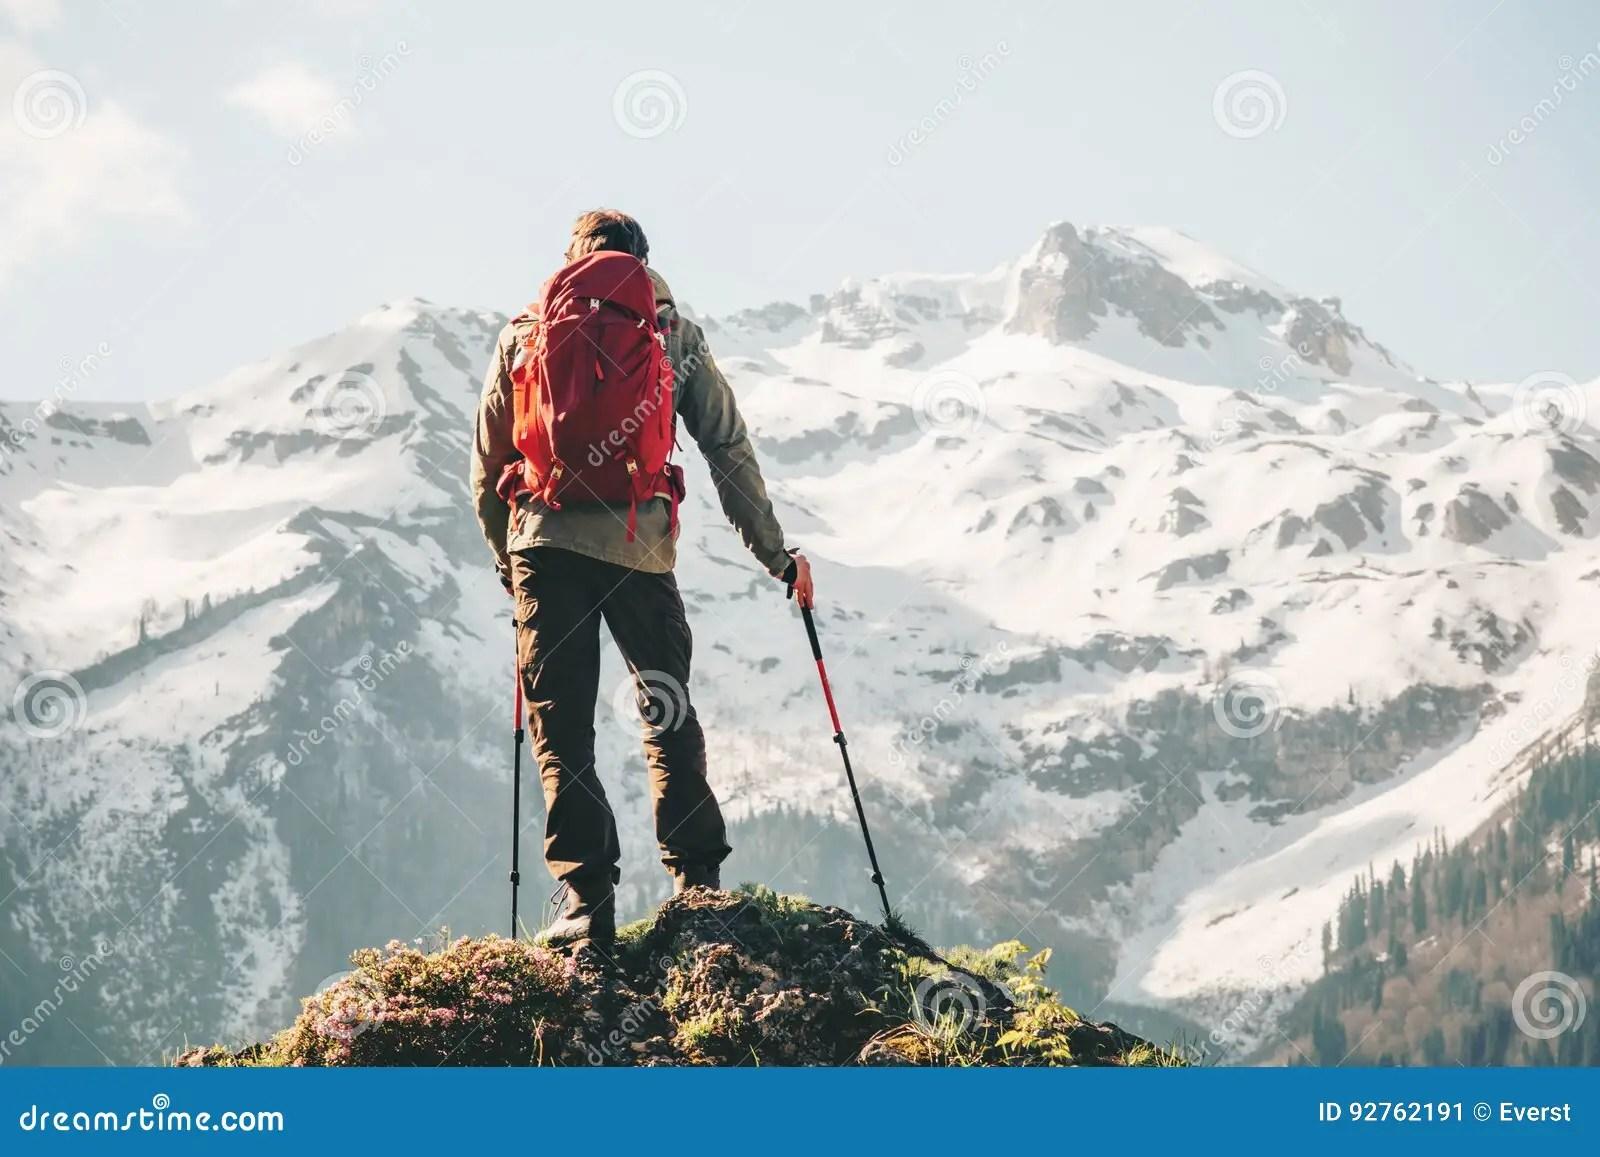 Climber Man Hiking With Backpack Stock Image  CartoonDealercom 92762191